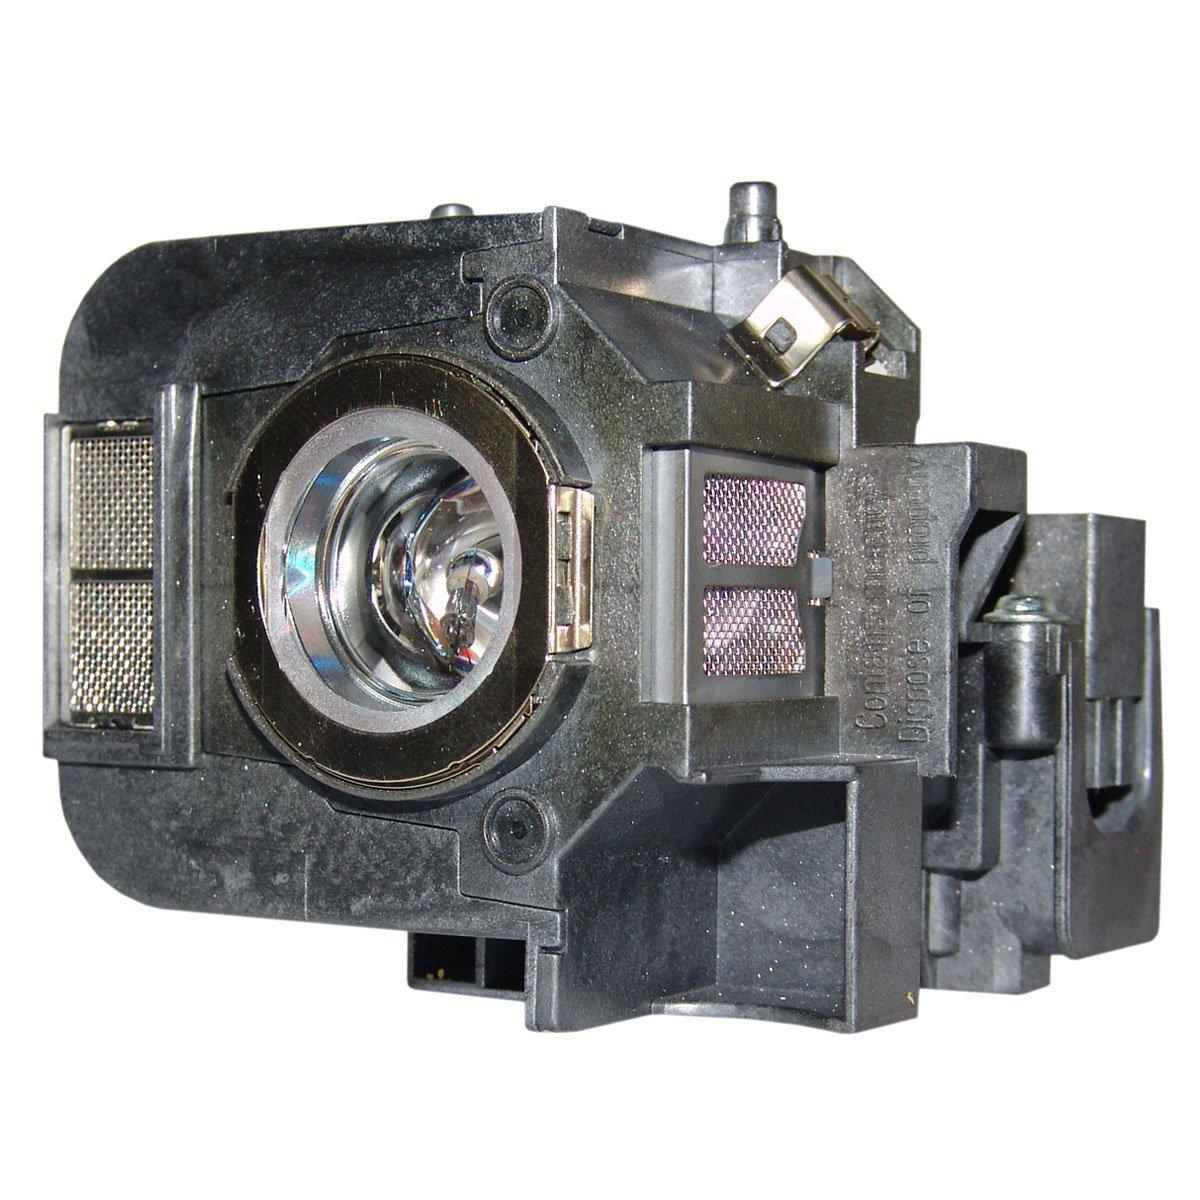 SpArc プロジェクター交換用ランプ 囲い/電球付き Epson H353A用 Economy B07MPSZ39D Lamp with Housing Economy